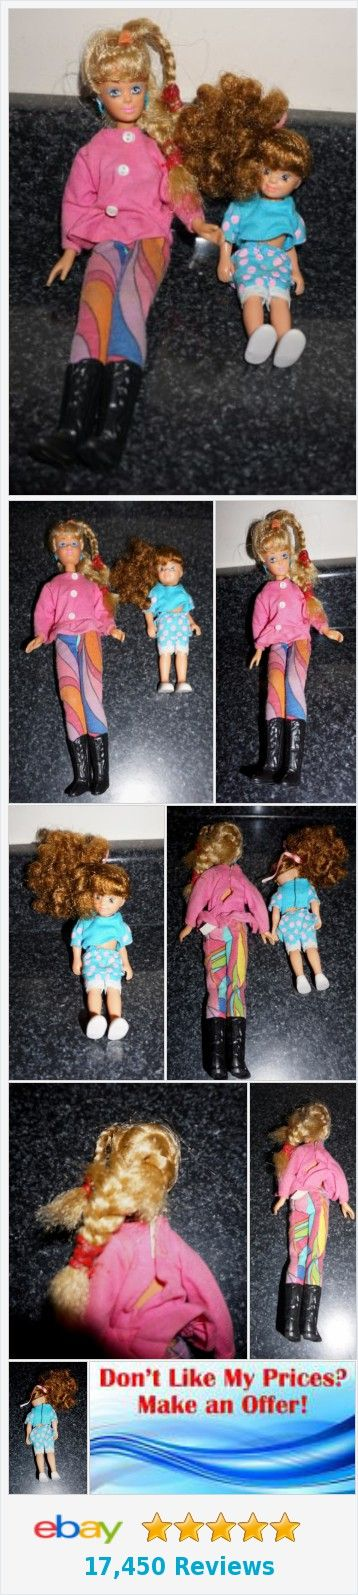 Stacey & Charlotte Baby-Sitters Club Remco 1991 #9334 Vintage Dolls - JB | eBay http://www.ebay.com/itm/-/352132023939?